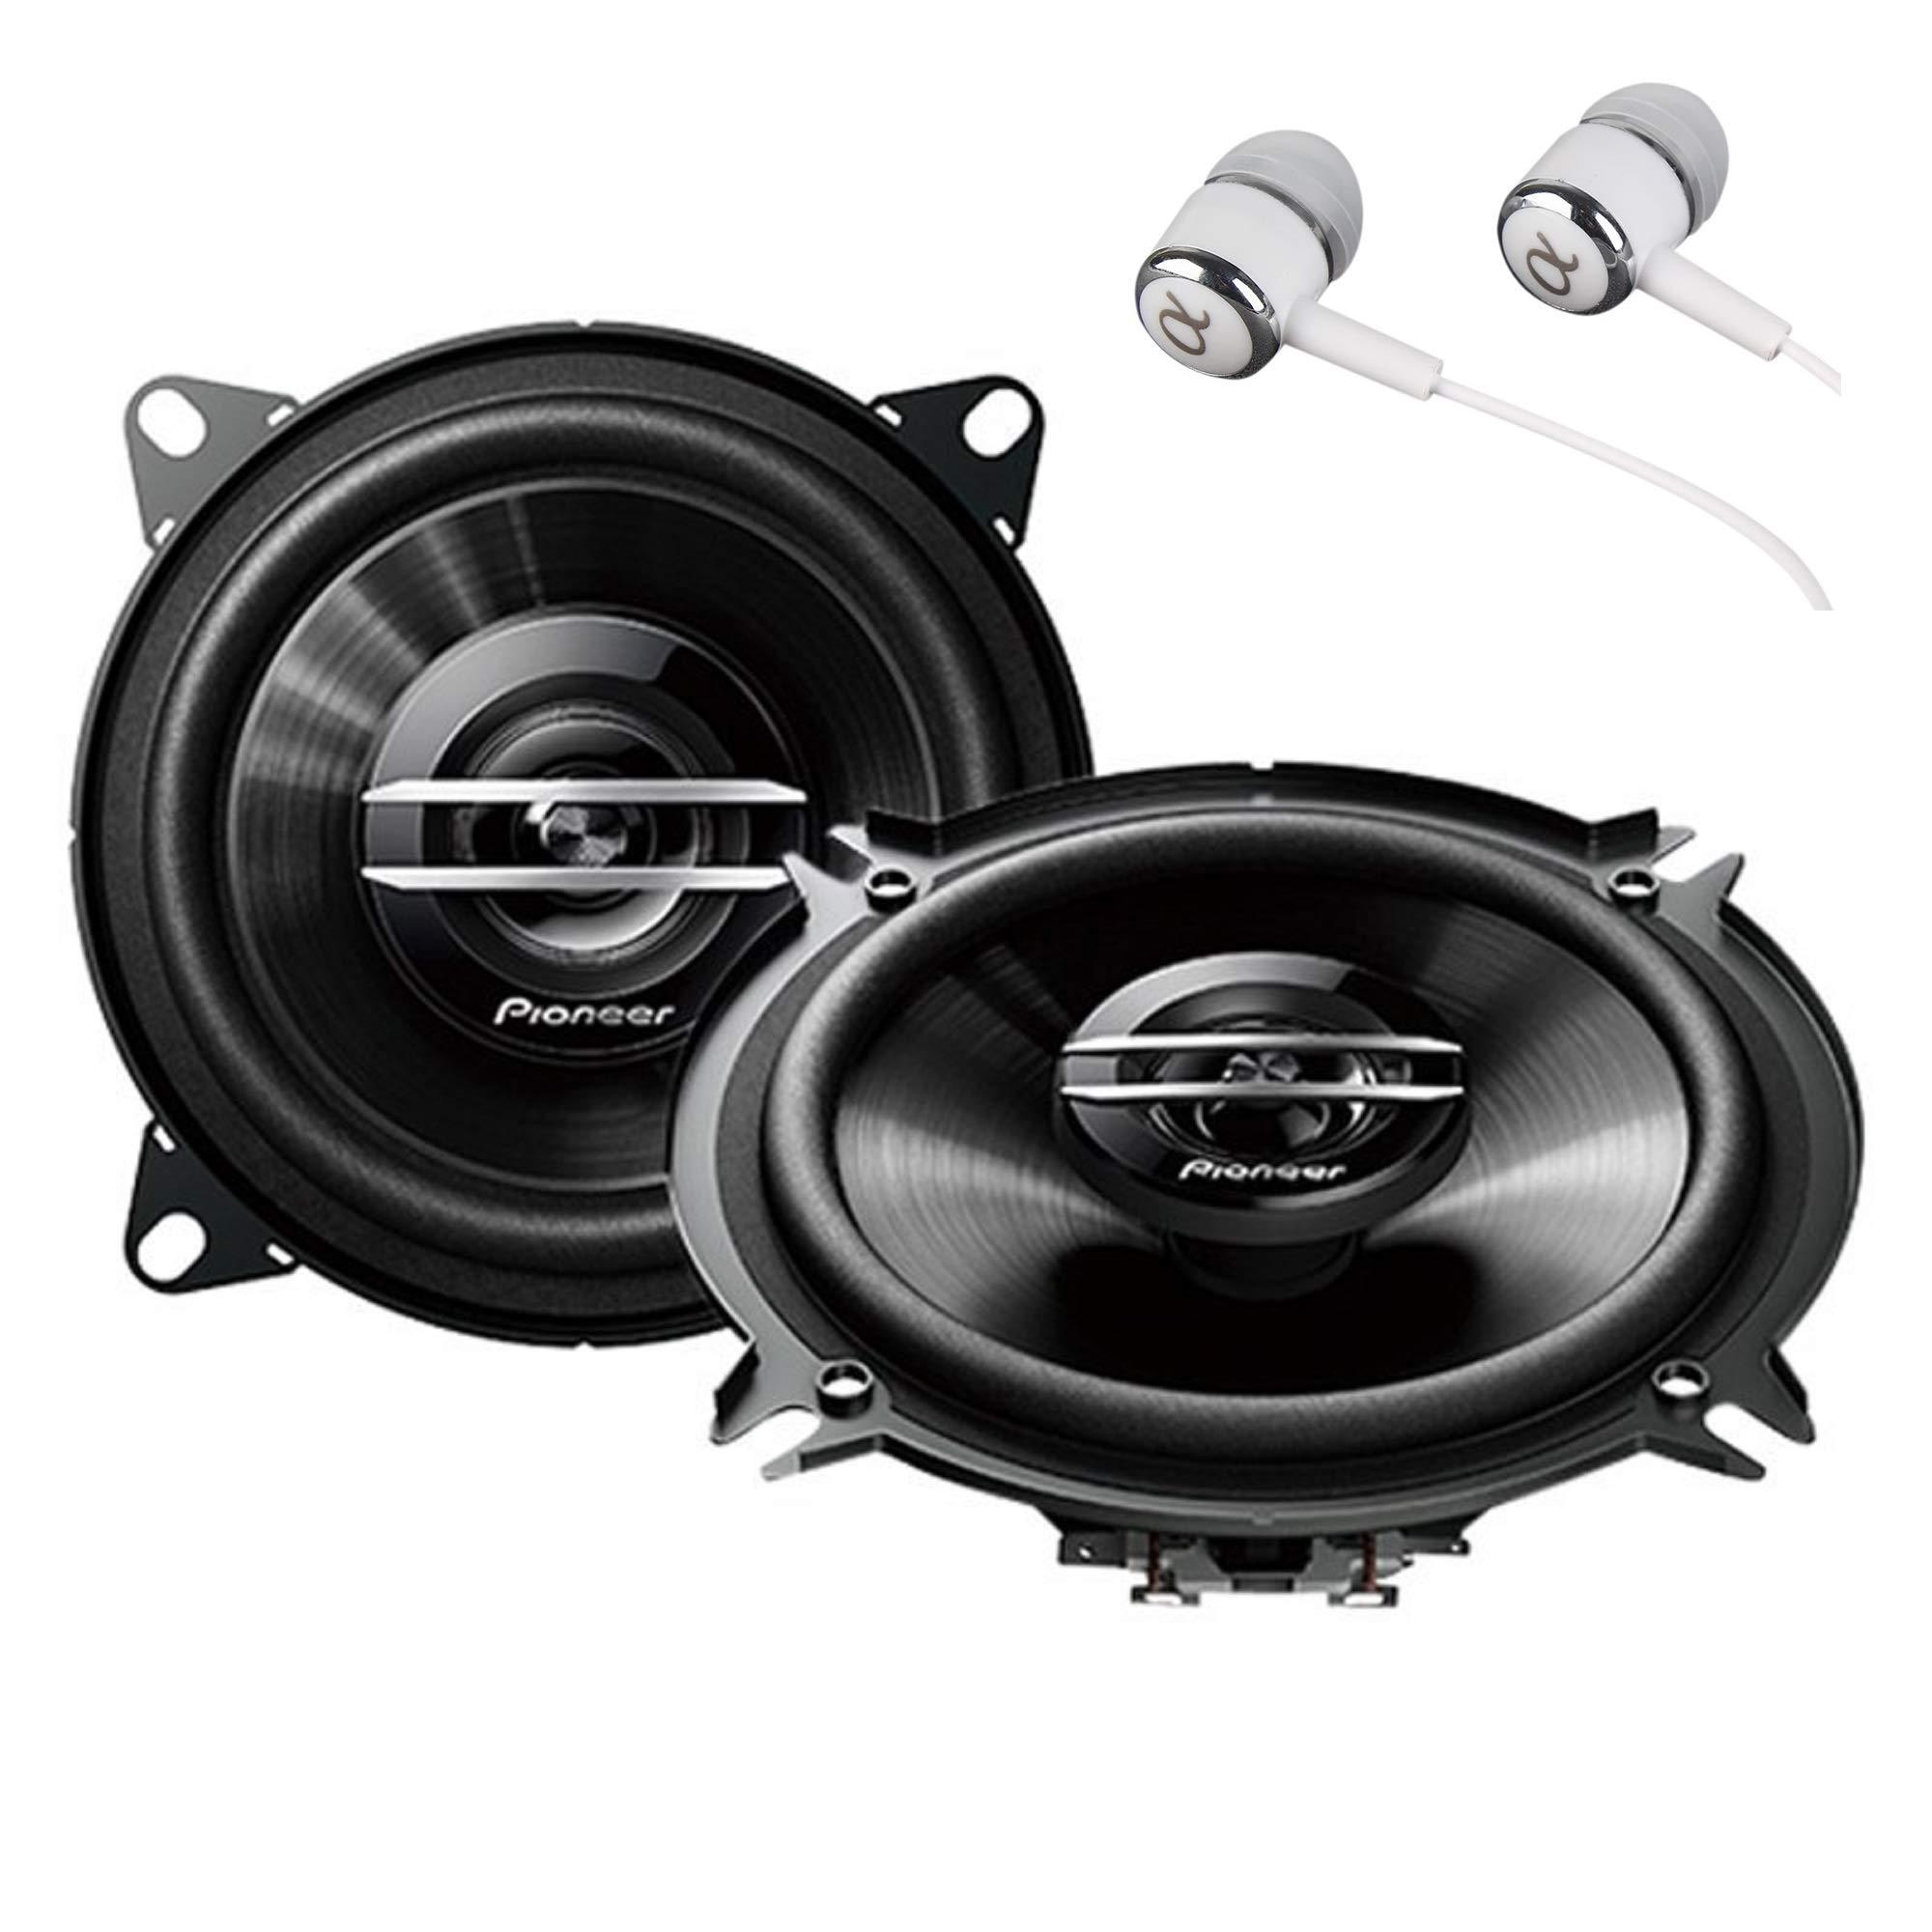 Pioneer TS-G1020S 420 Watts Max Power 4'' 2-Way G-Series Coaxial Full Range Car Audio Stereo Speakers/Free ALPHASONIK Earbuds